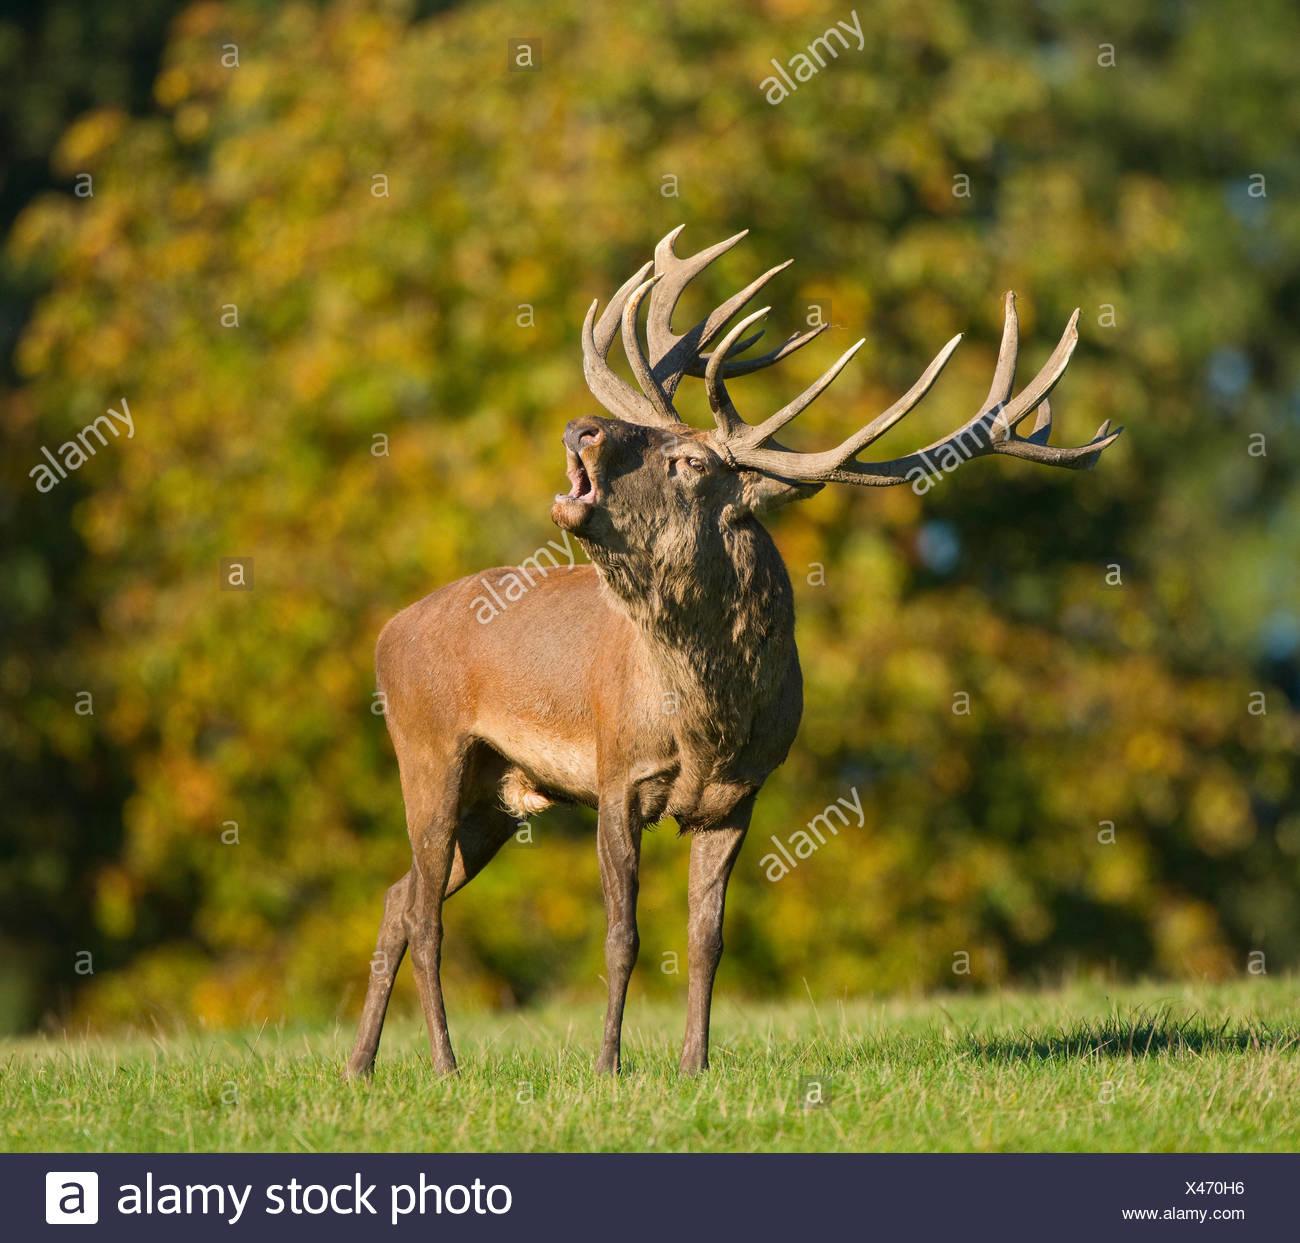 Red Deer (Cervus elaphus) bellowing during rutting season, captive, Lower Saxony, Germany - Stock Image